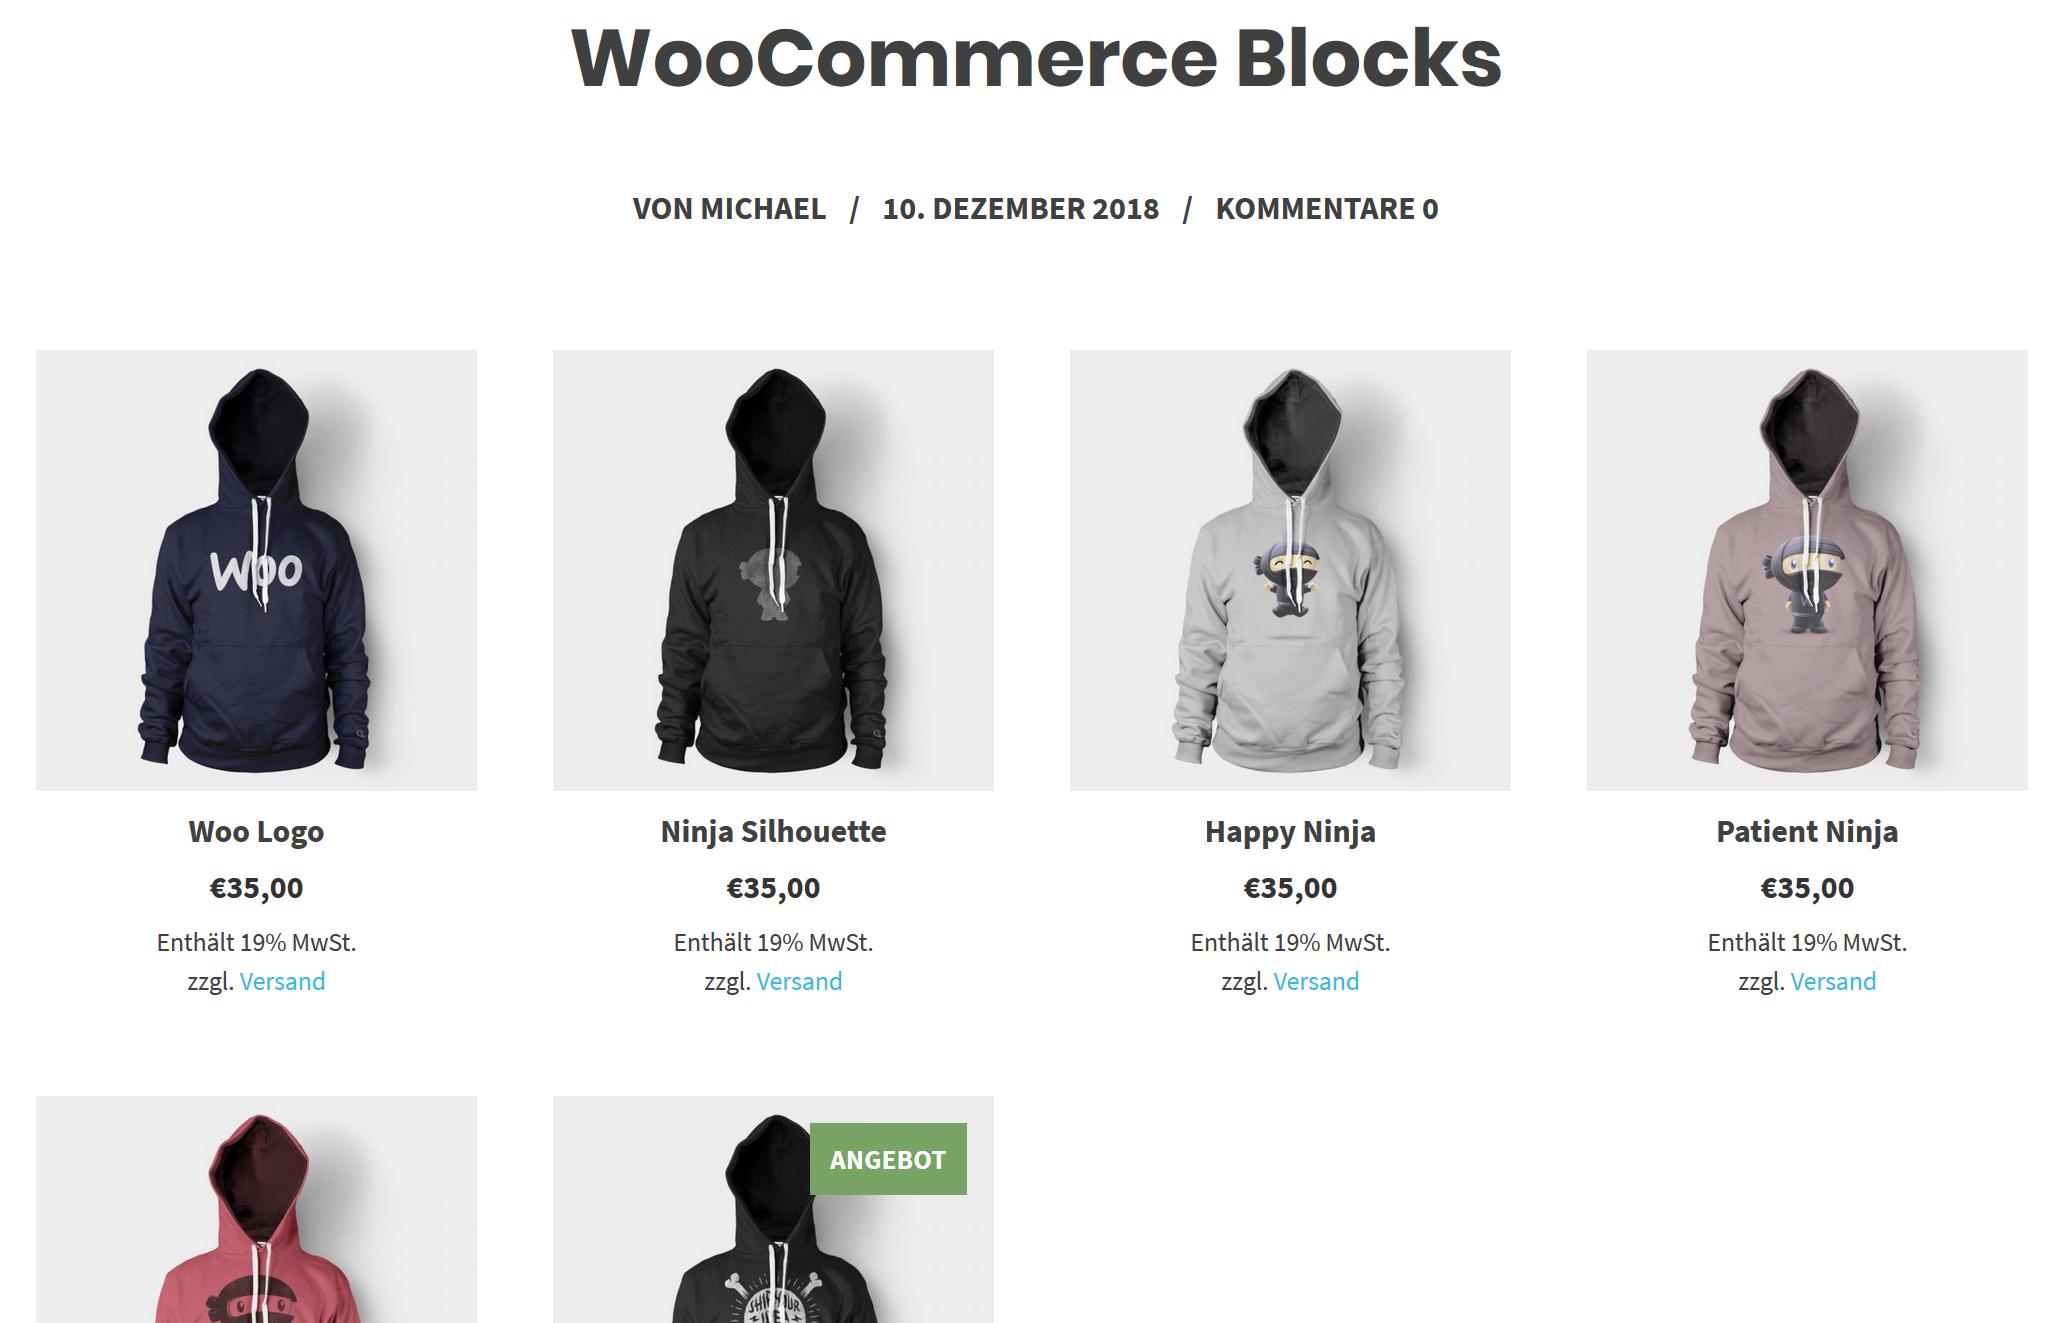 mehrere produktblocks WooCommerce